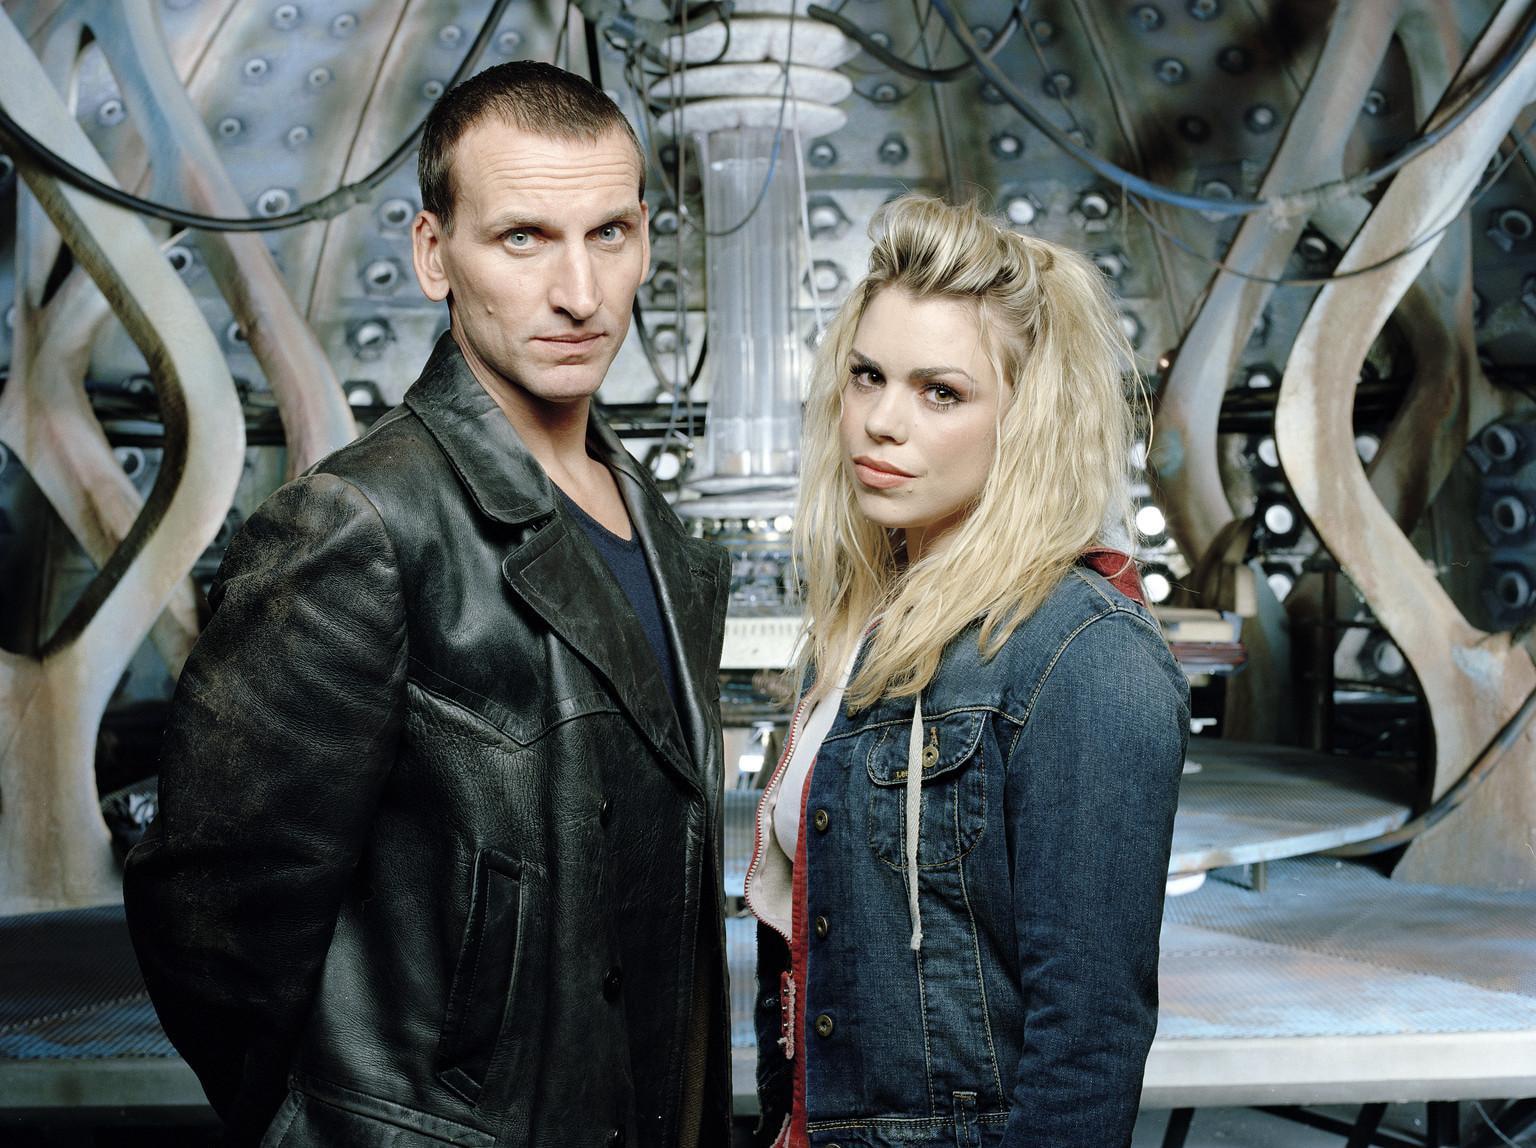 Doctor Who: saresti un ottimo Dalek thumbnail